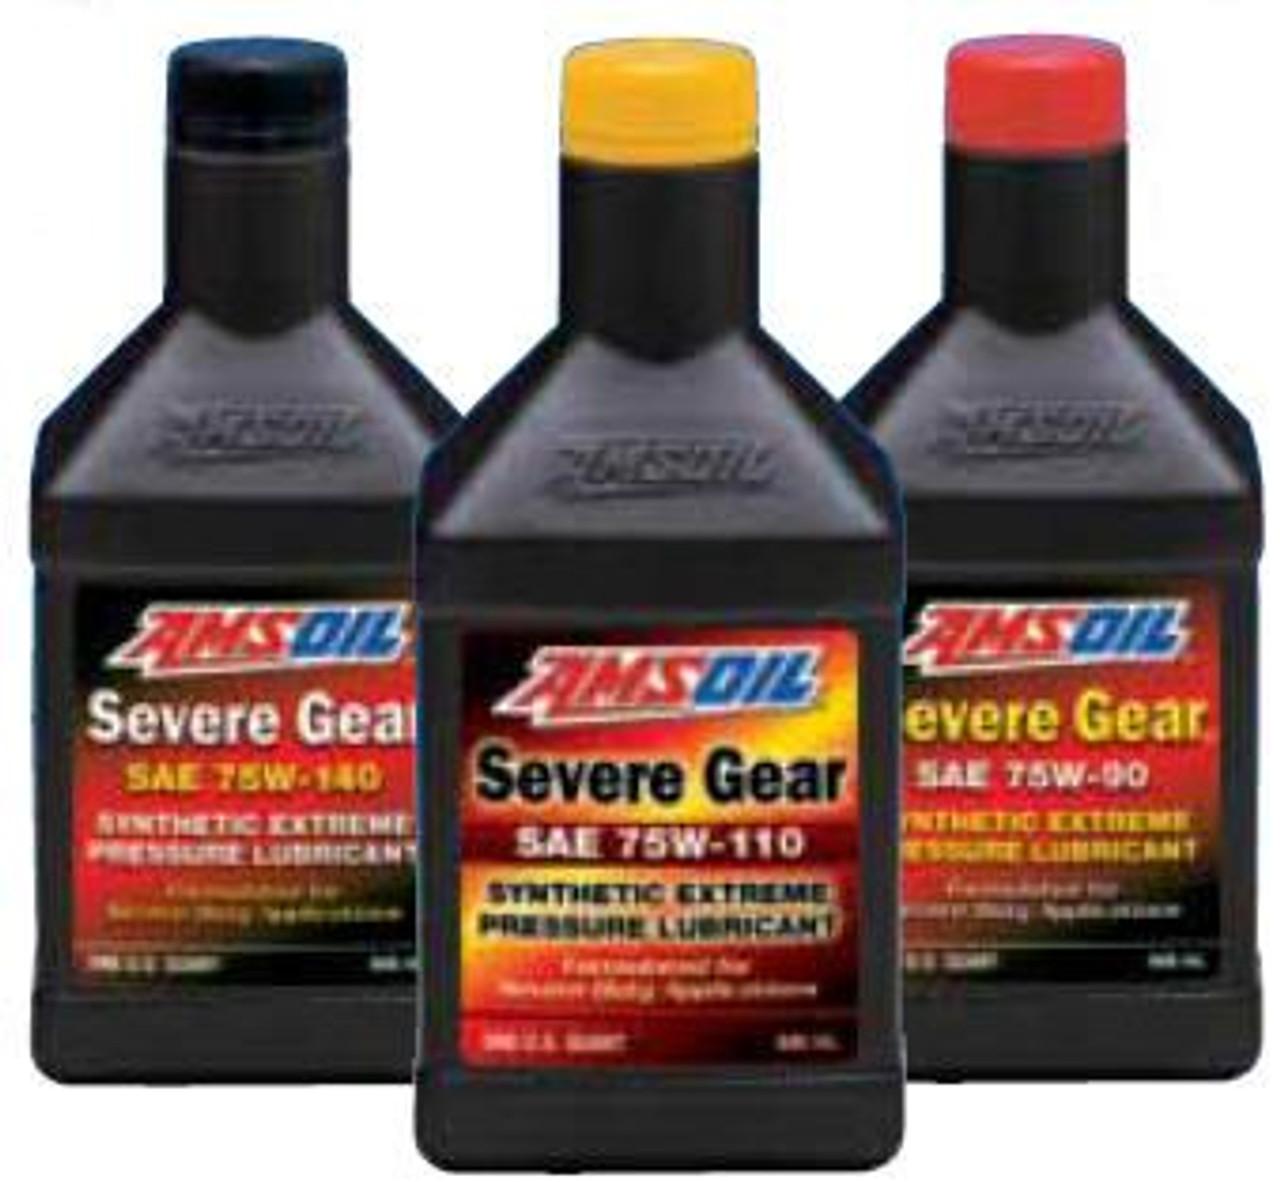 Amsoil Severe Gear 75w 90 >> Amsoil Severe Gear 75w 90 Css Central Speed Supply Llc